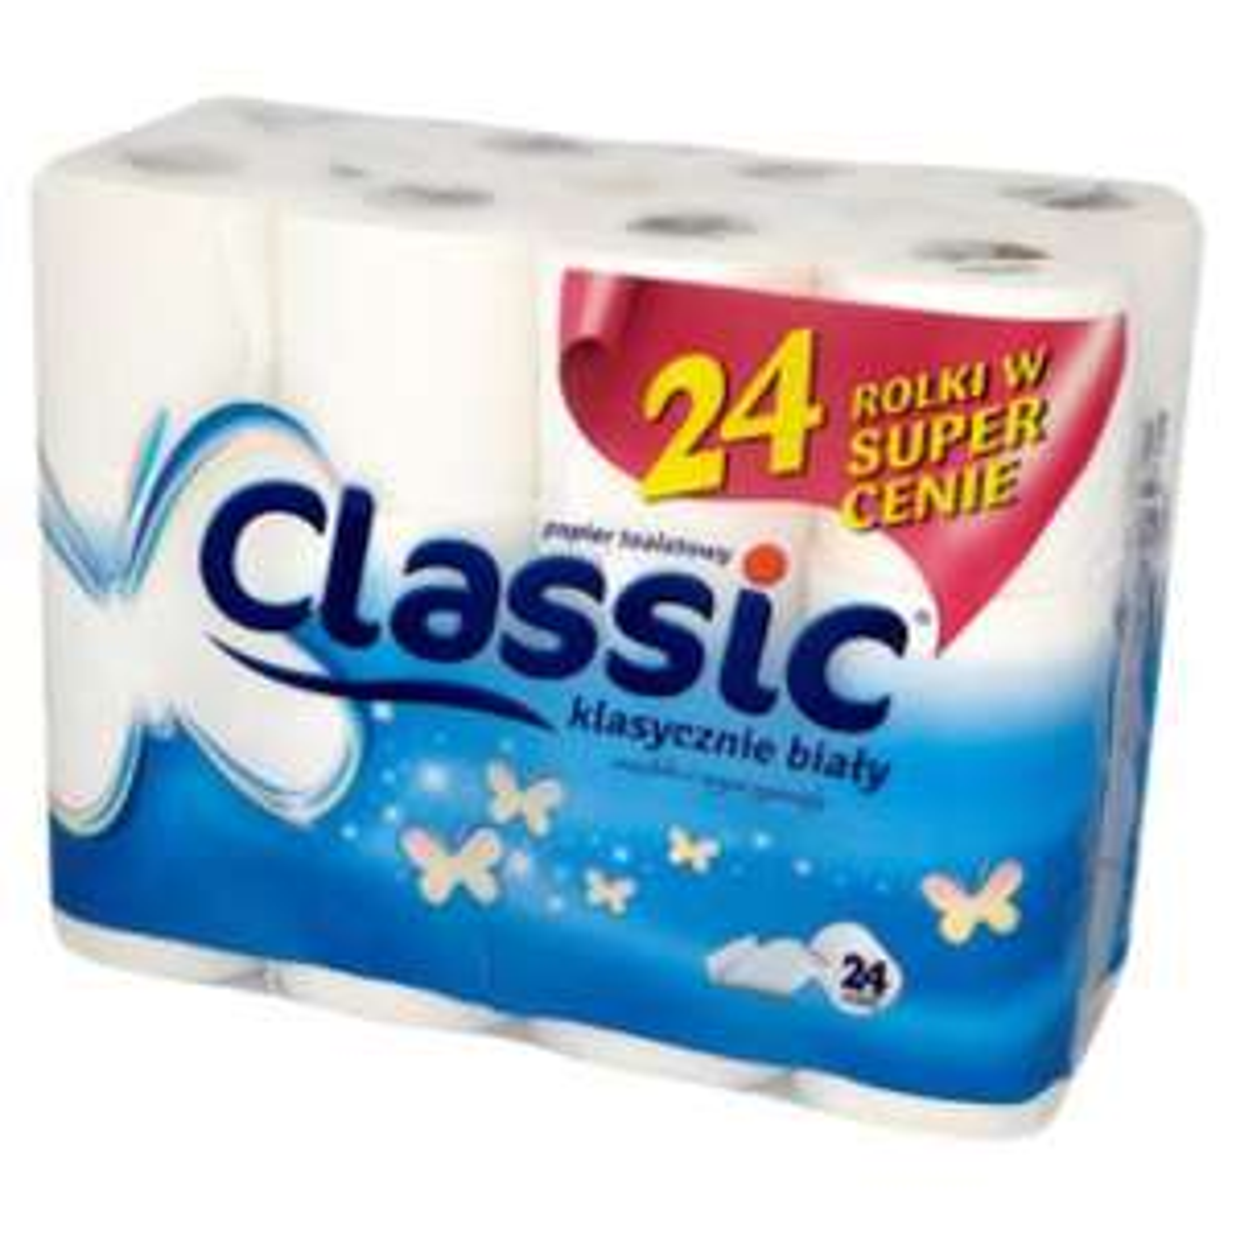 24 Rolki papieru toaletowego. Tesco